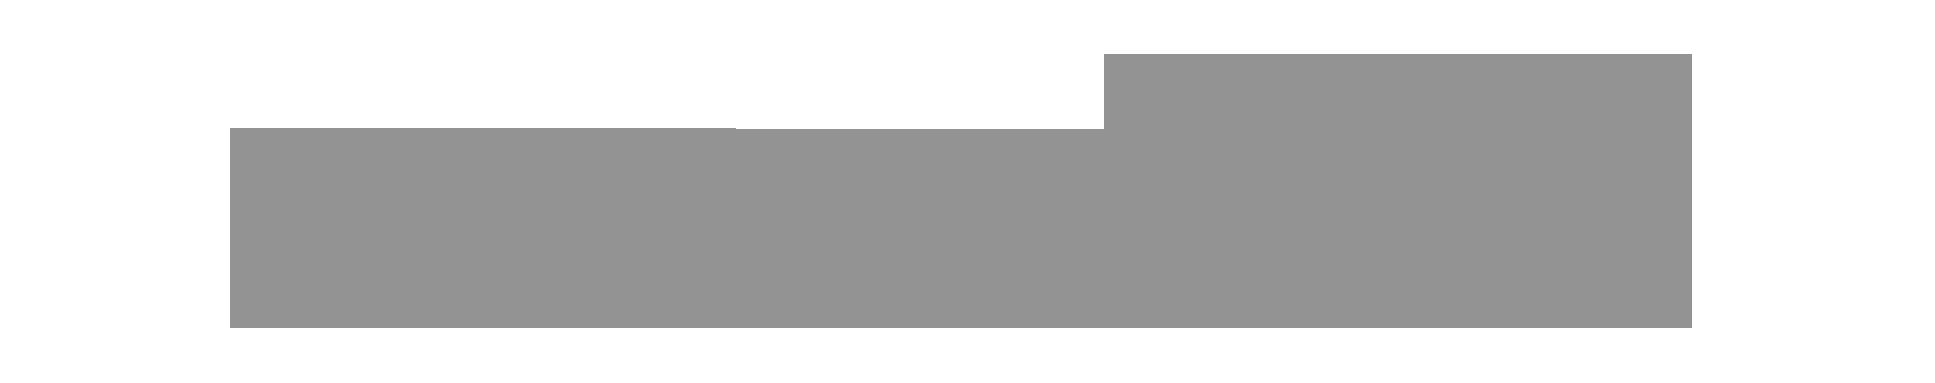 vmworld-bw